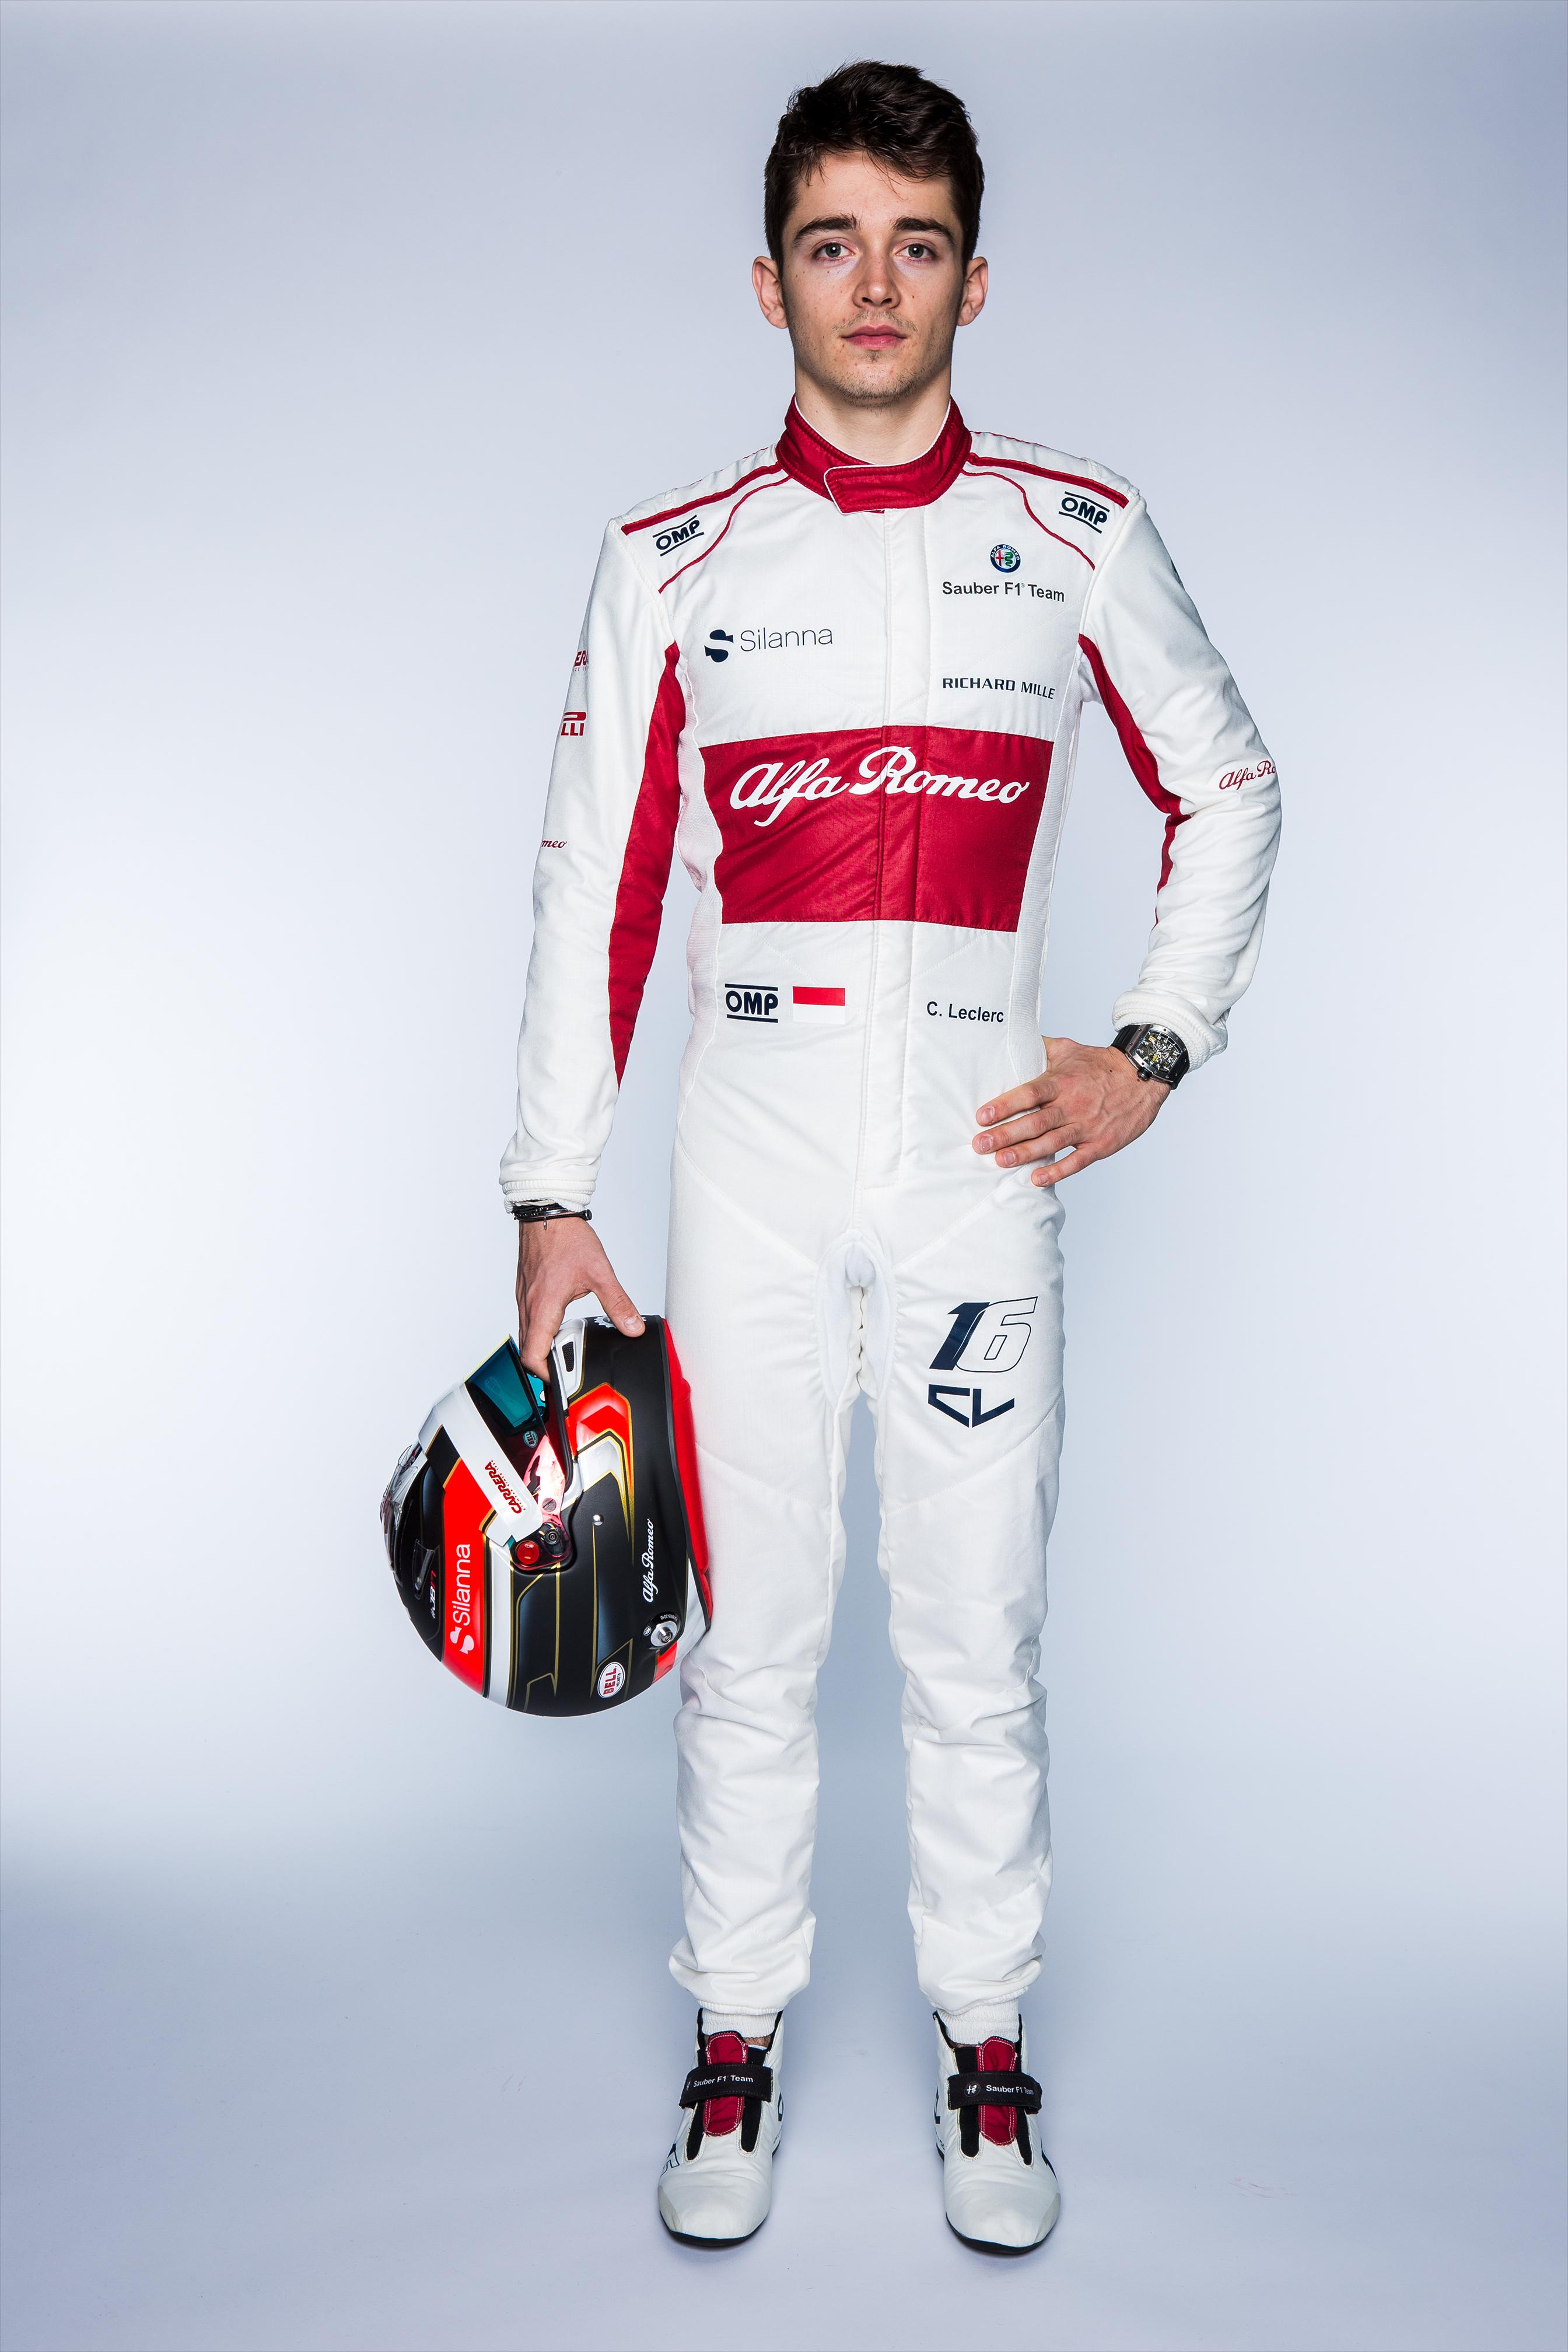 Alfa Romeo Sauber Lec Full Body Frontal With Helmet Arm Up Autograph